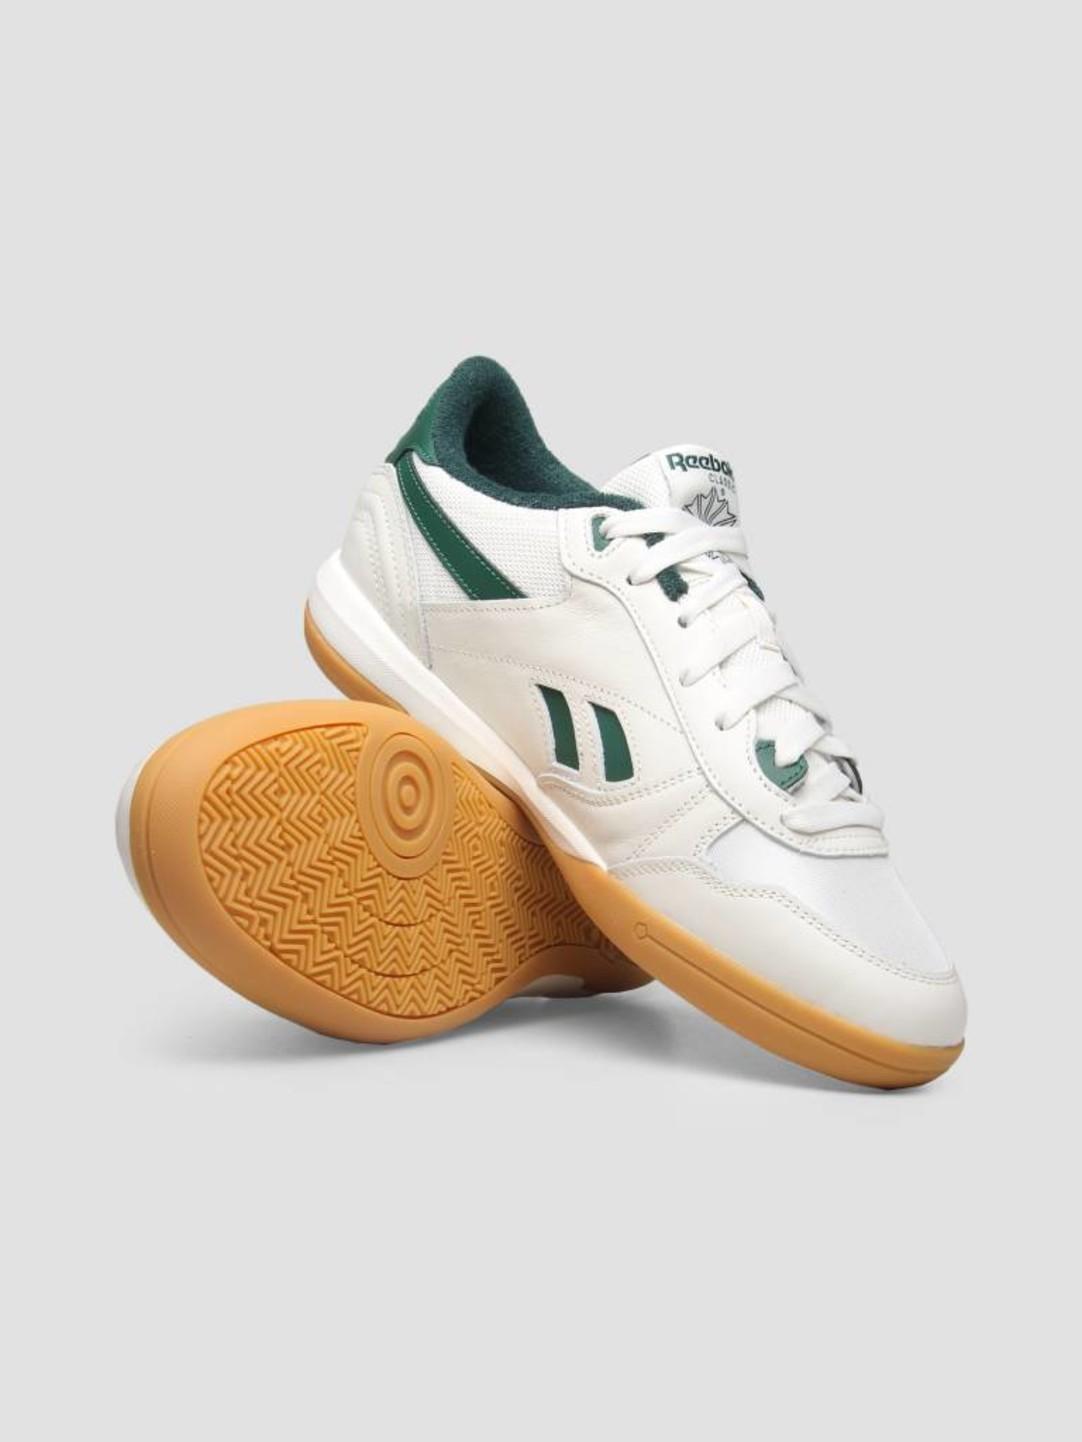 Reebok adidas Unphased Pro Chalk Dark Green DV4086